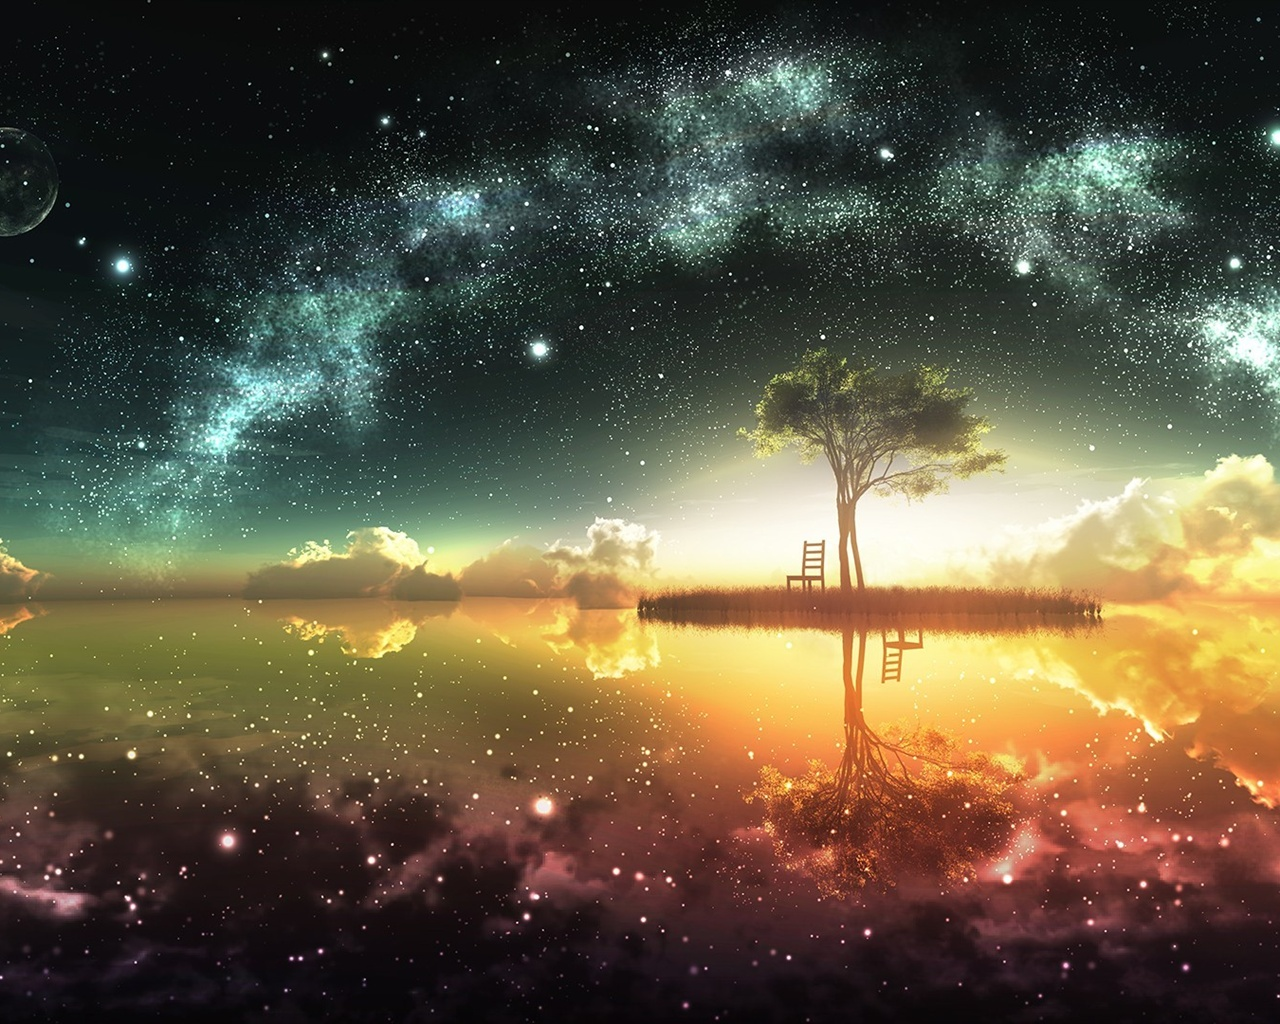 Beautiful Artwork Design Moon Island Chair Tree Stars Water